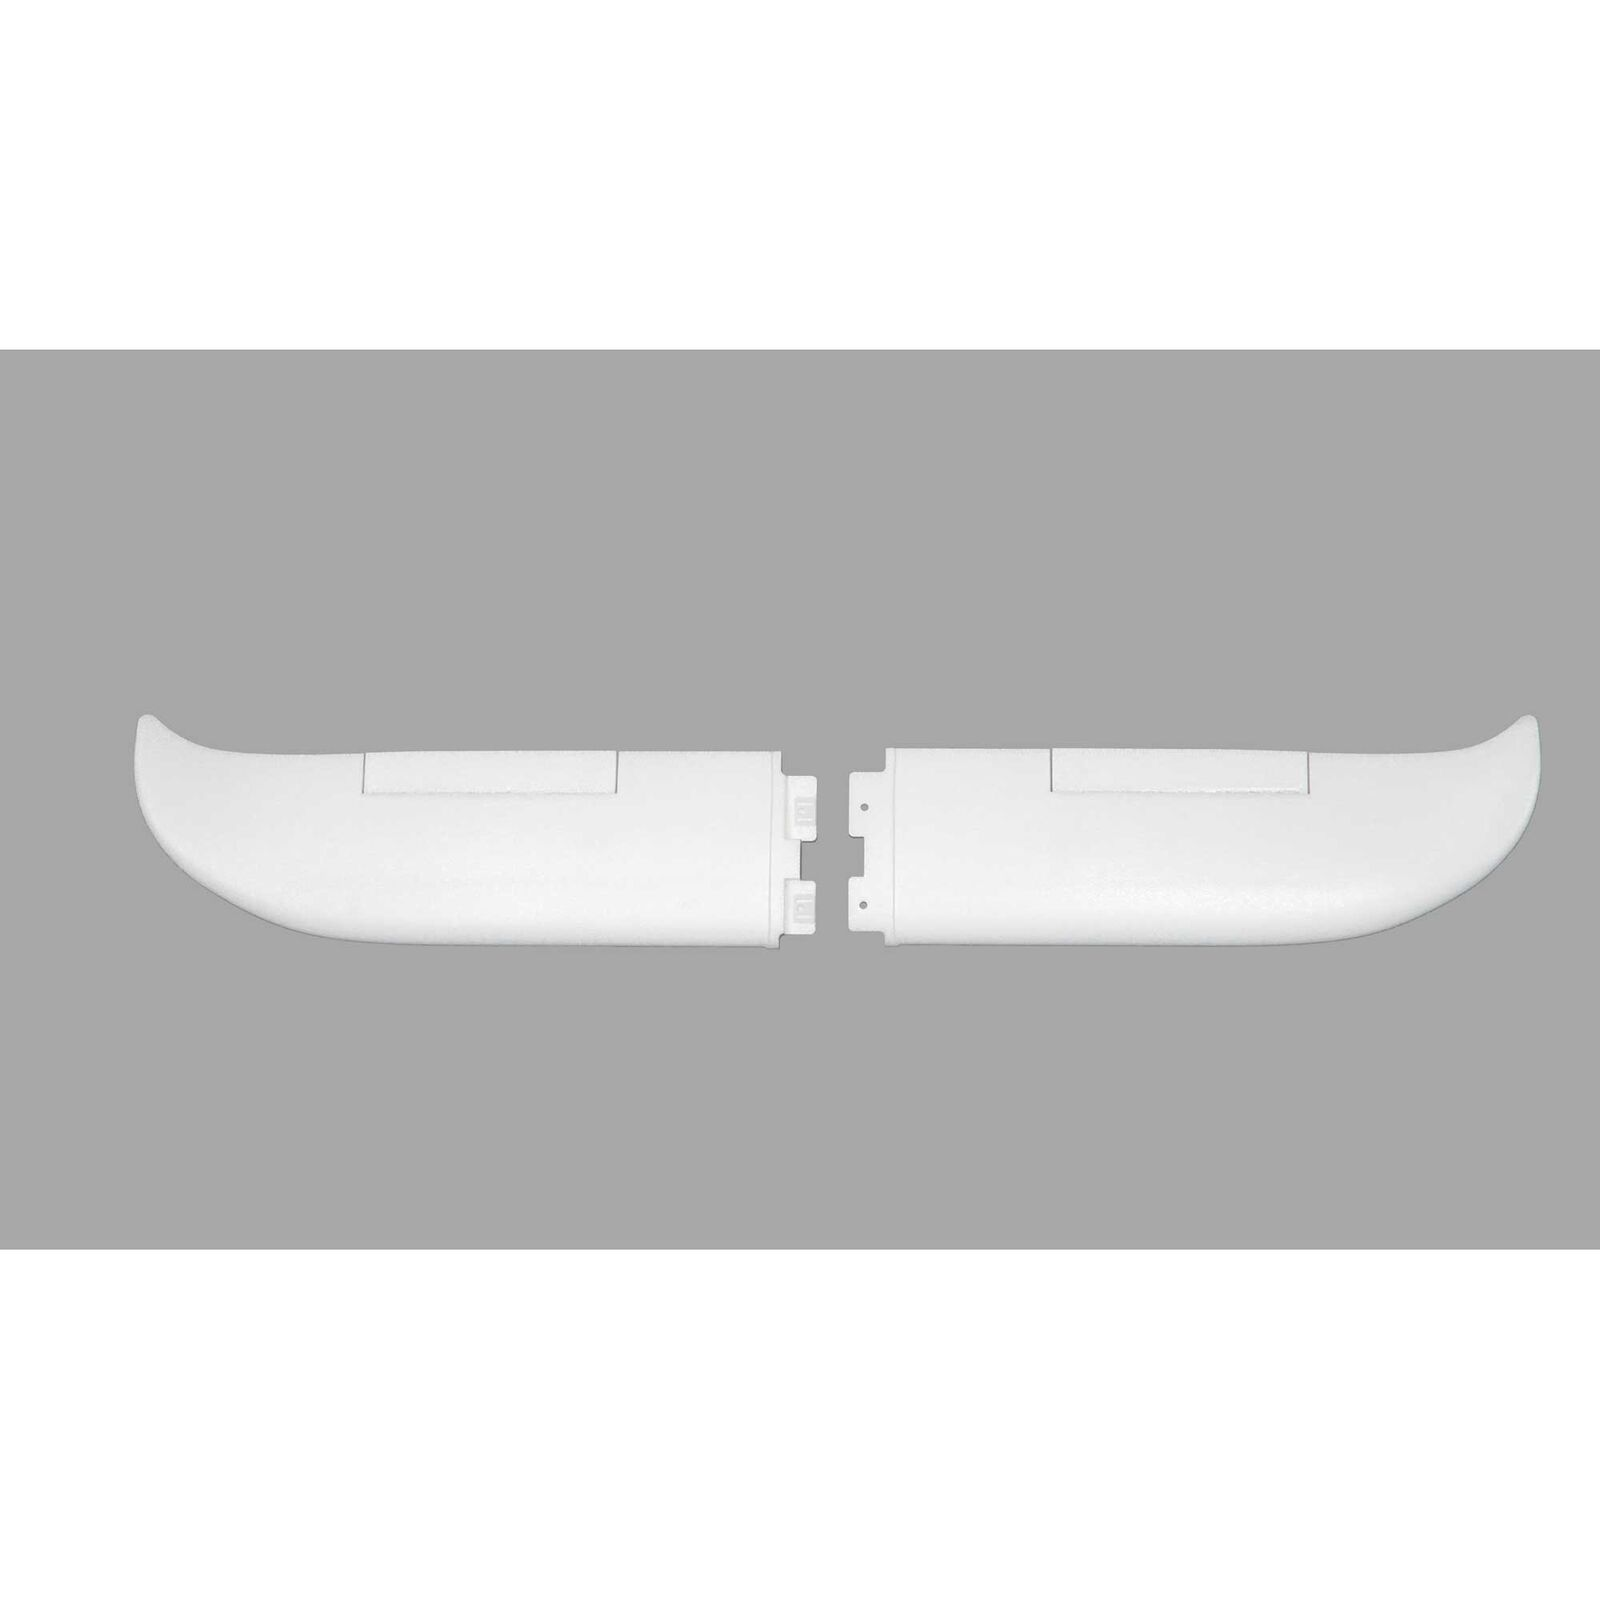 Main Wing Set: Easy Trainer 1280 V2